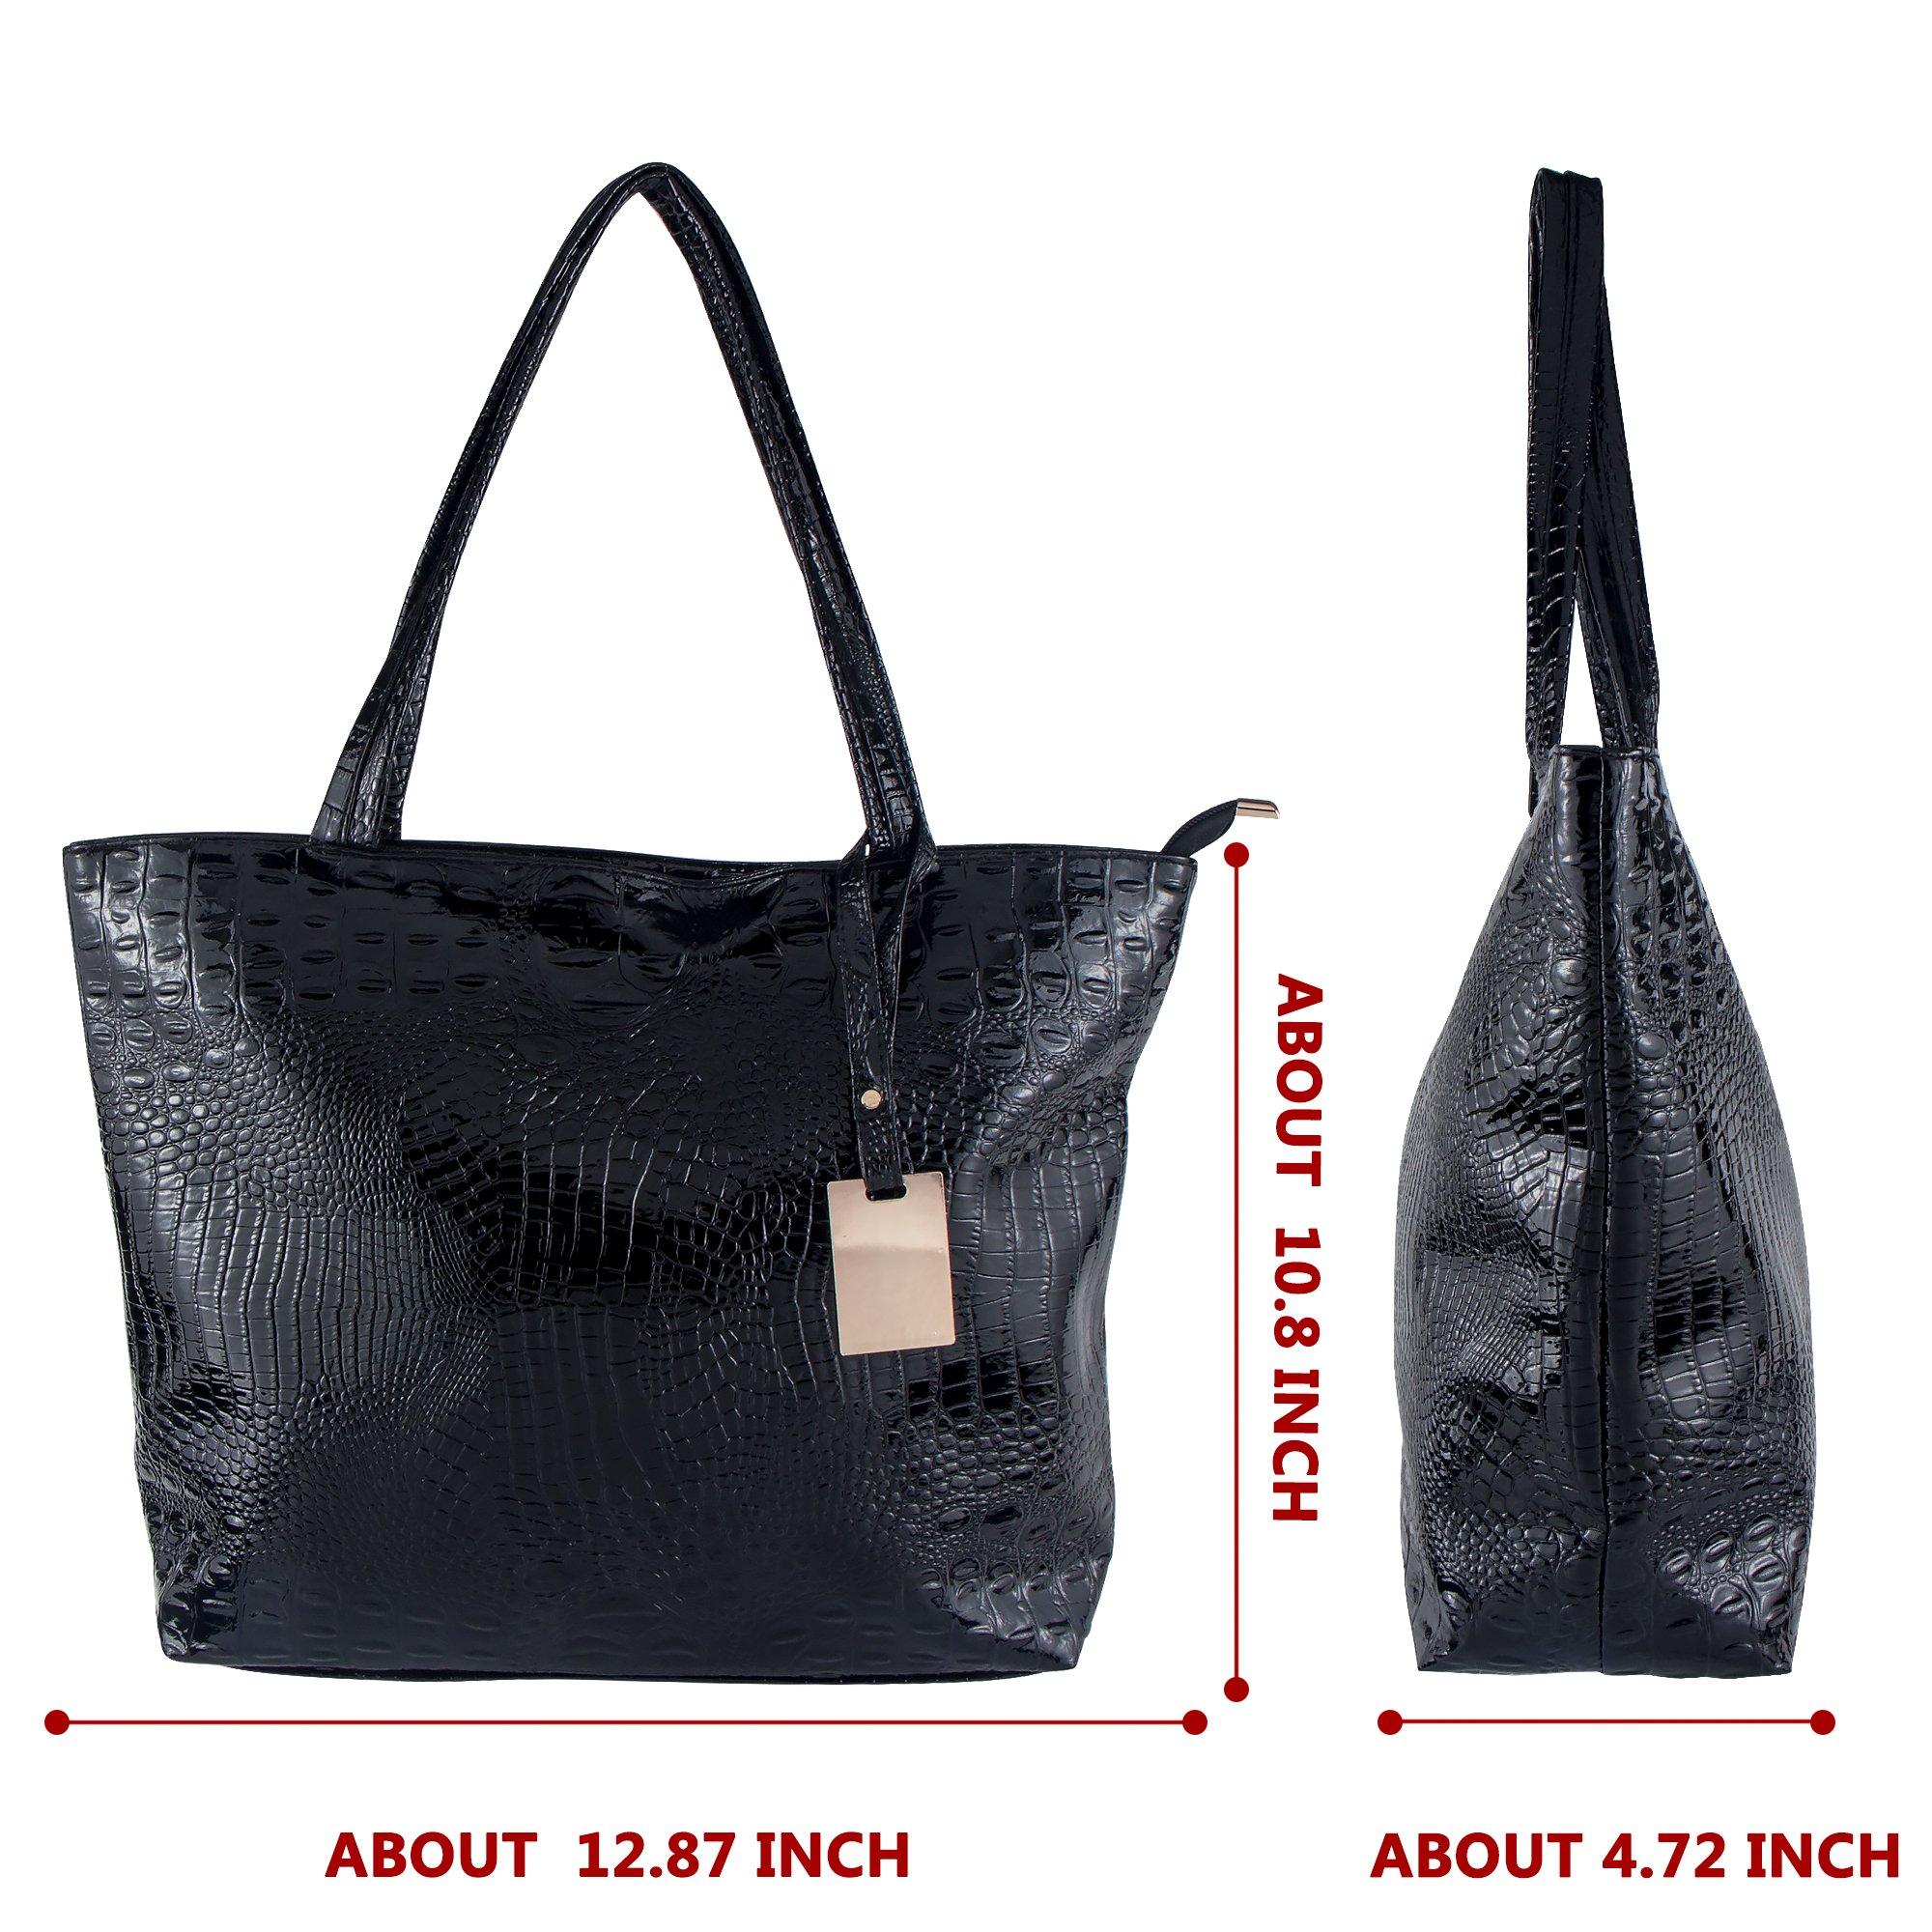 Bagood Womens Crocodile Pattern PU Leather Casual Shopping Handbags High Capacity Shoulder Ladies Soft Bag for Wedding Bridal Prom Party Black by Bagood (Image #4)